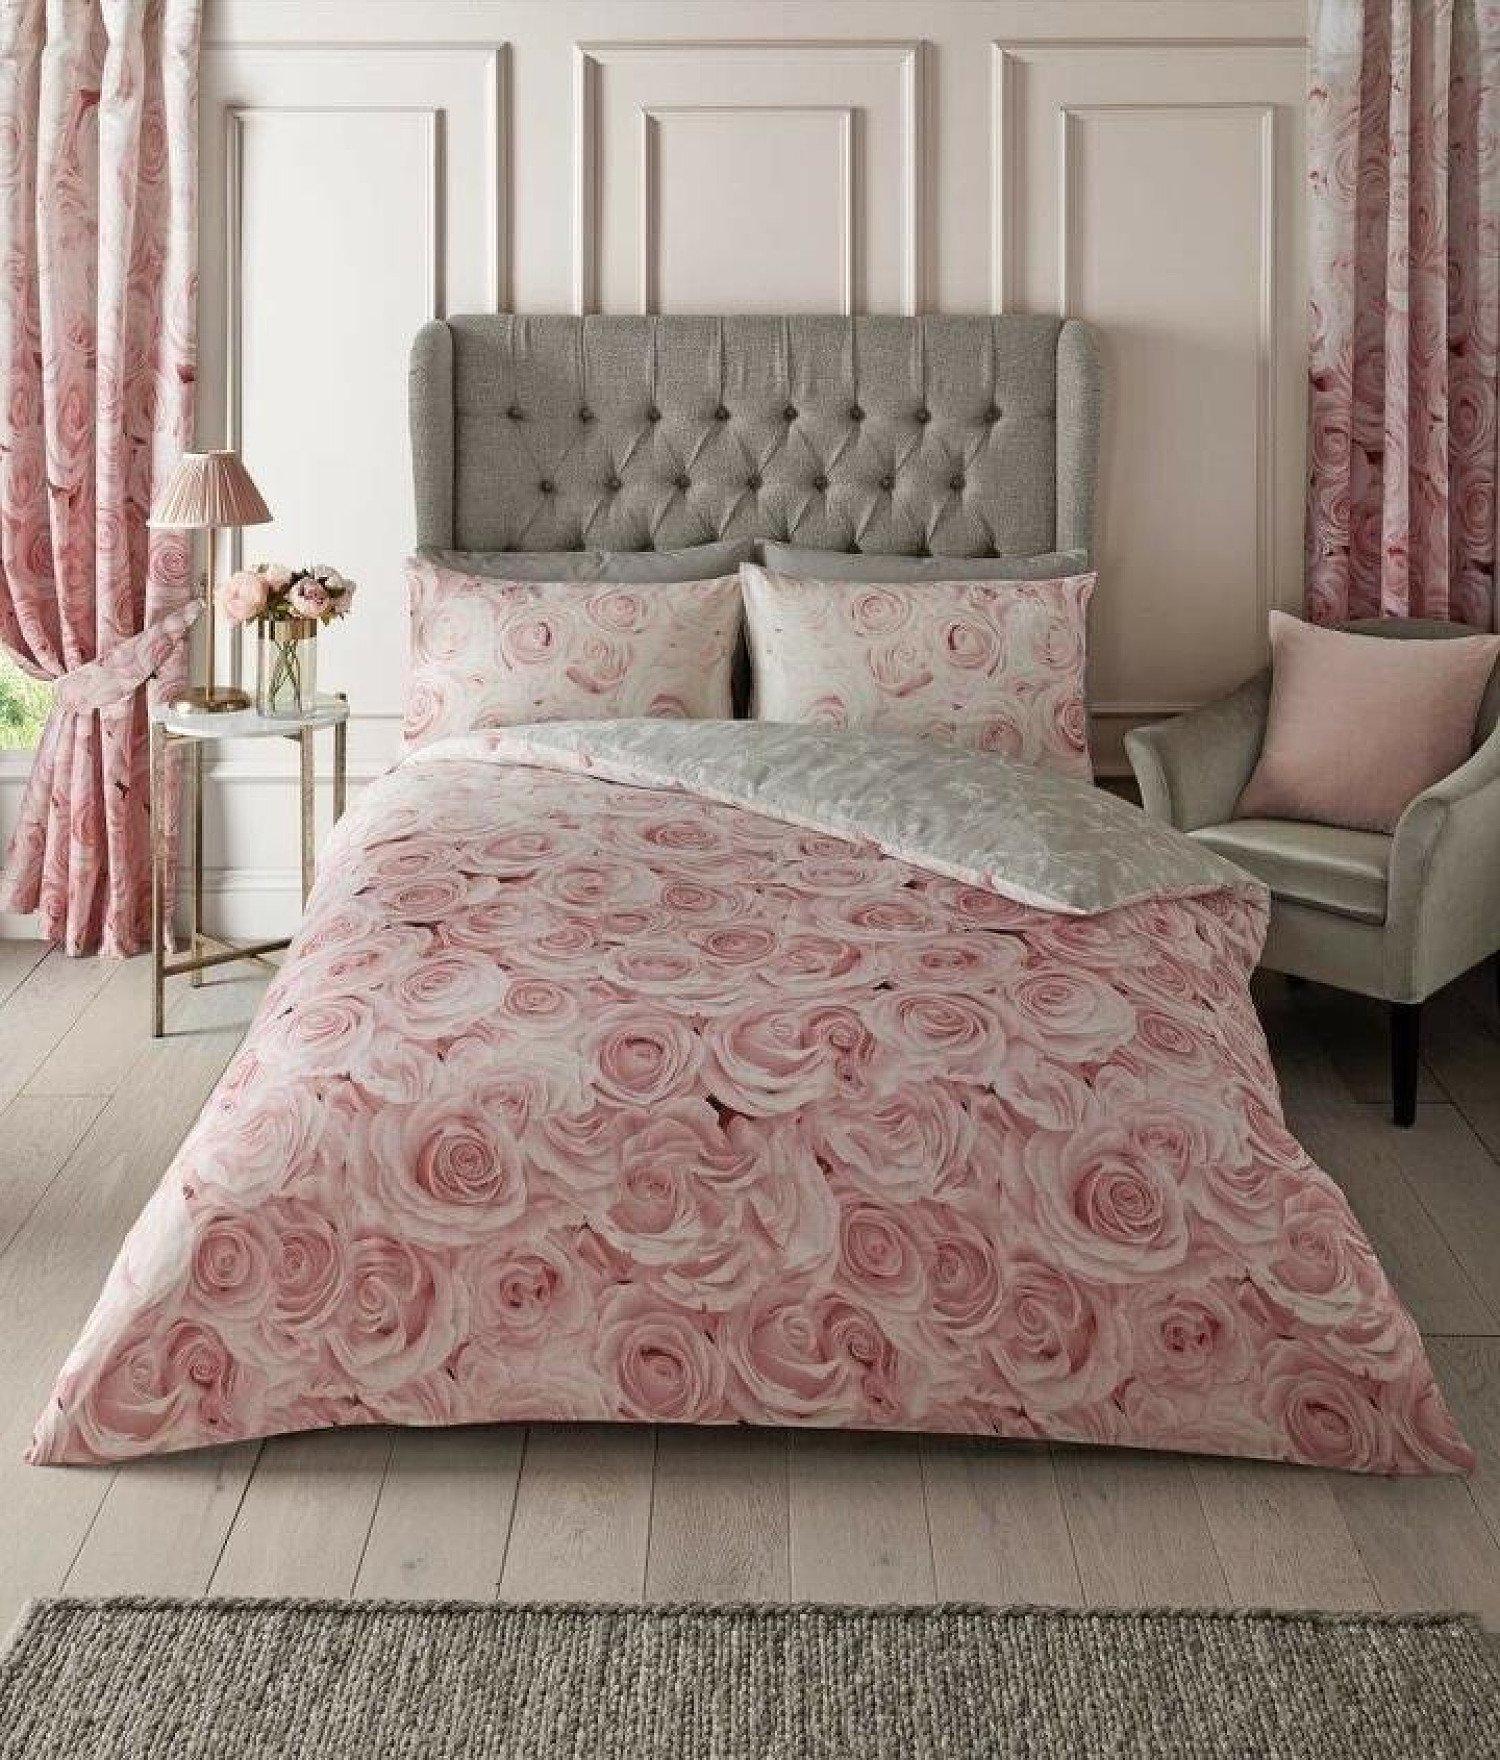 Blush Pink Rose Flower Duvet Set Reversible Grey Quilt Cover - Single, Double, King and Super King